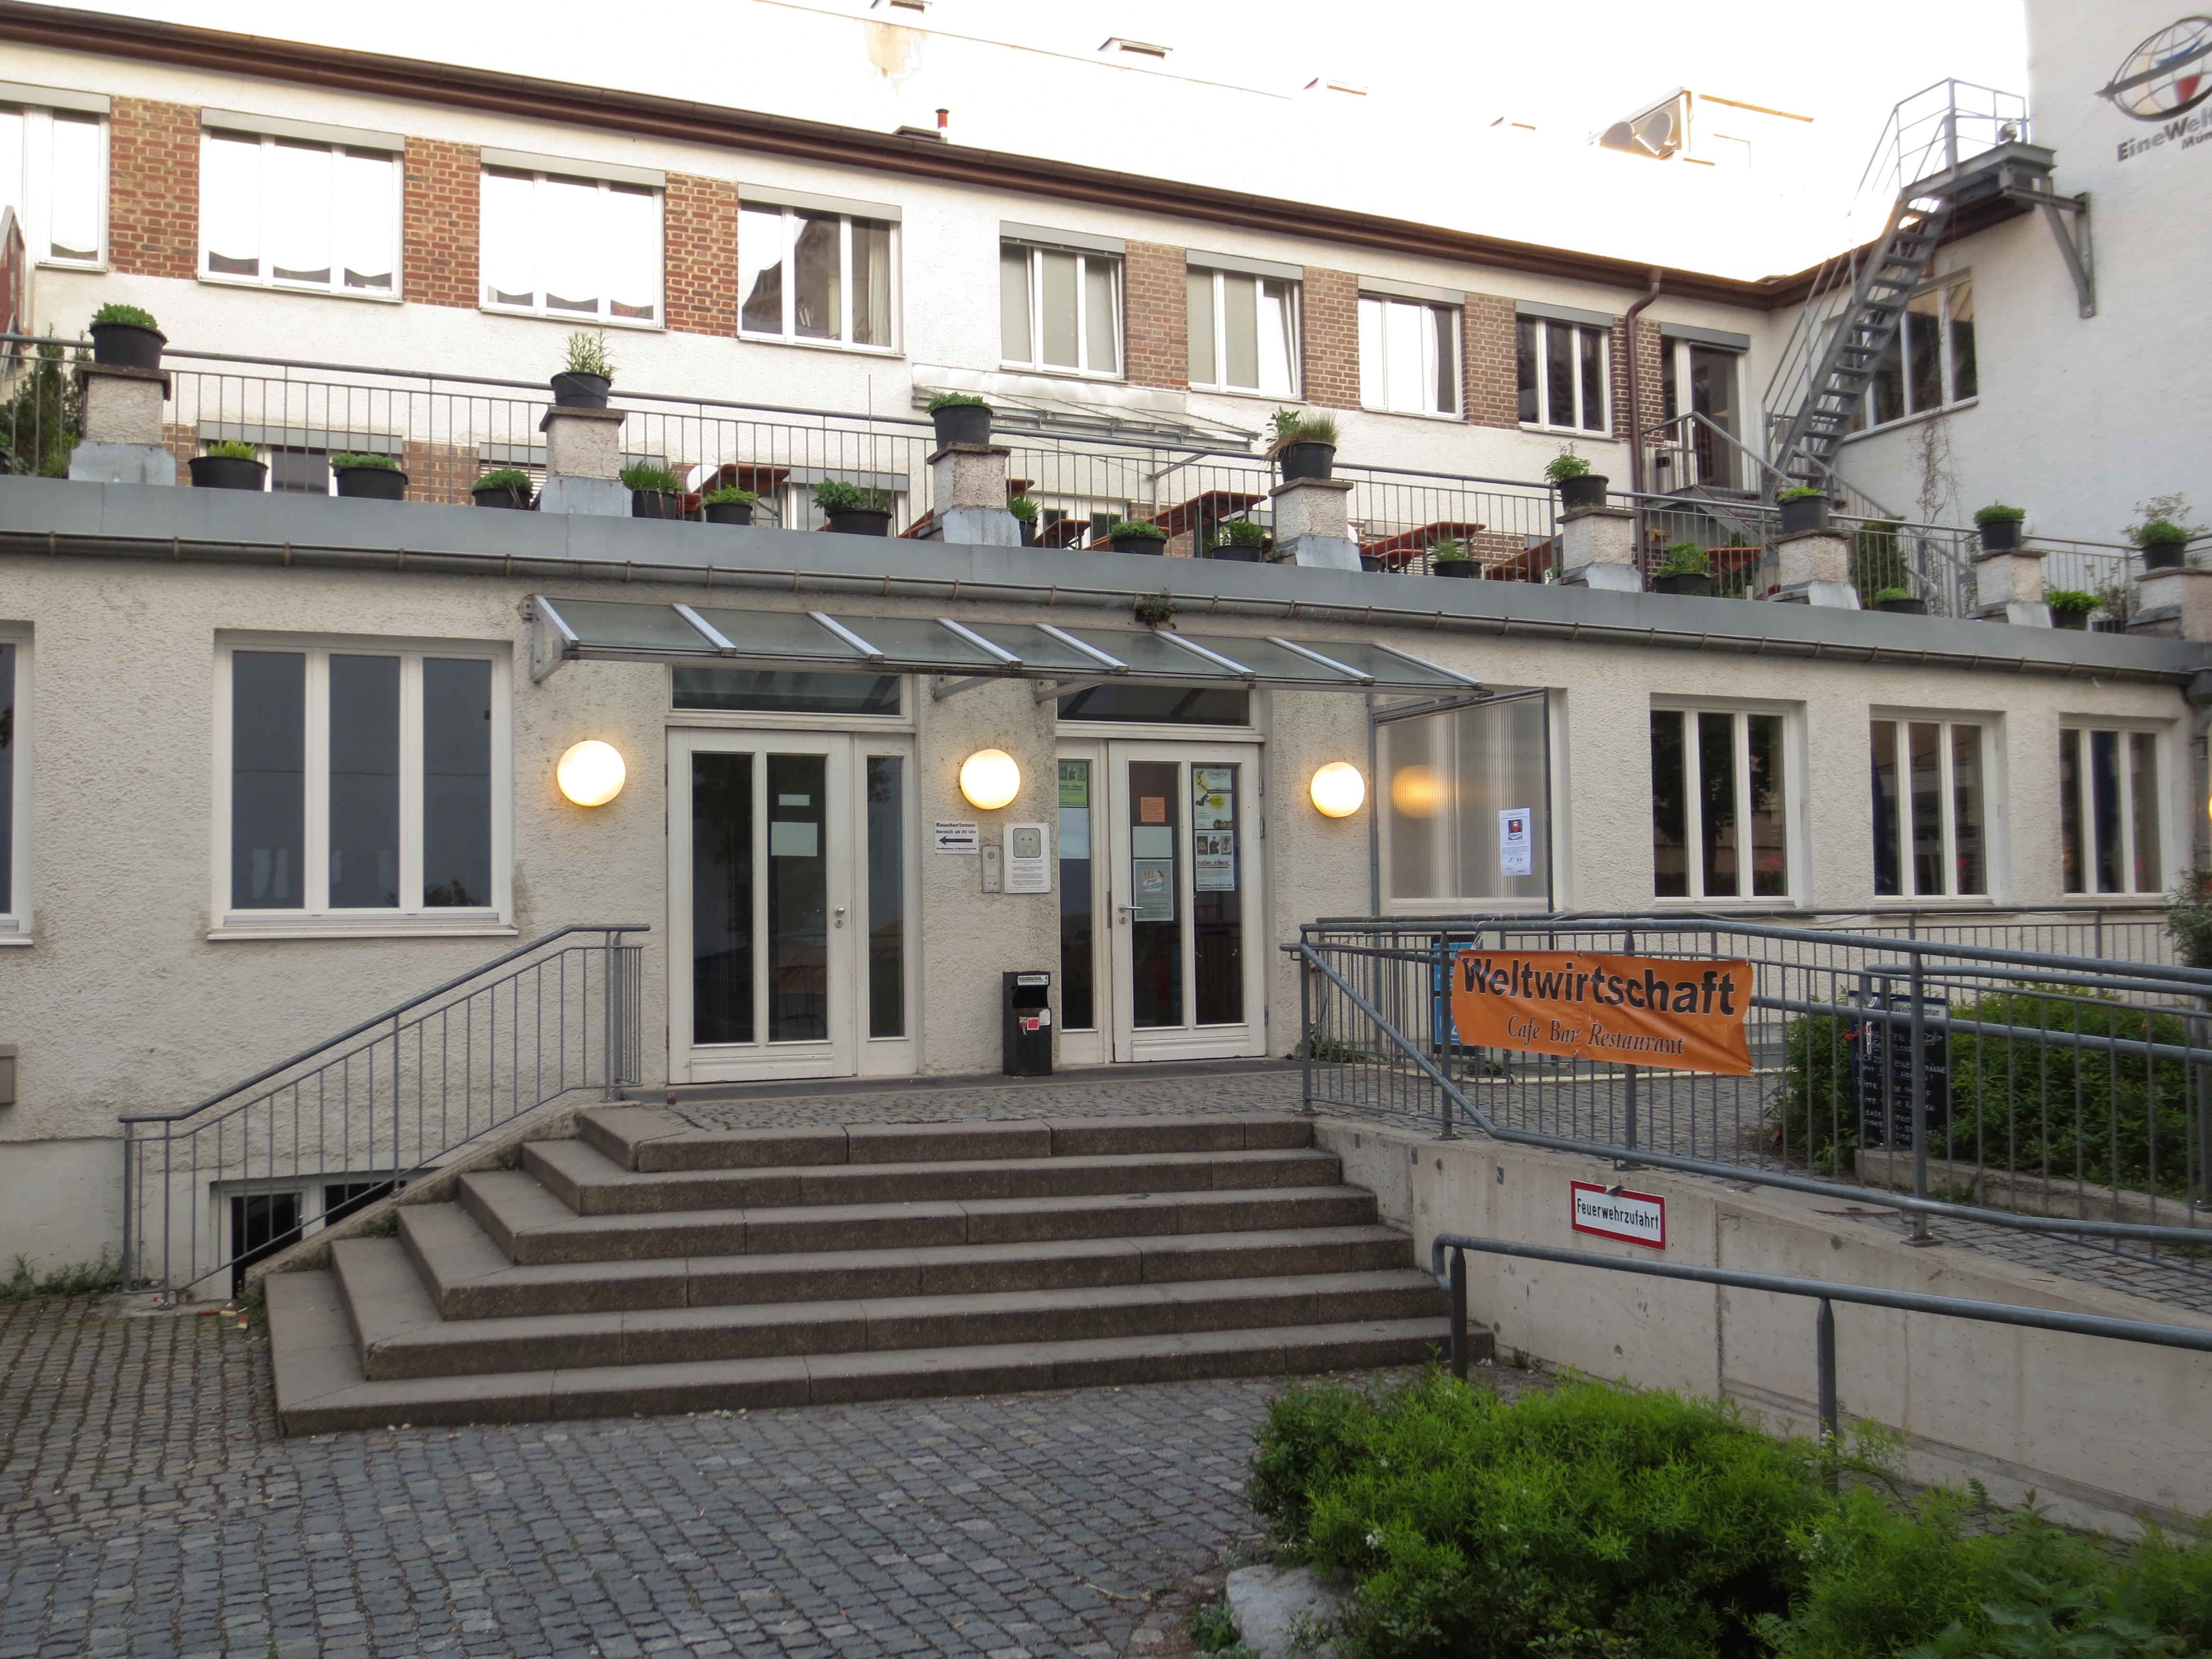 File:Eine Welt Haus München 001.jpg - Wikimedia Commons size: 4587 x 3440 post ID: 8 File size: 0 B